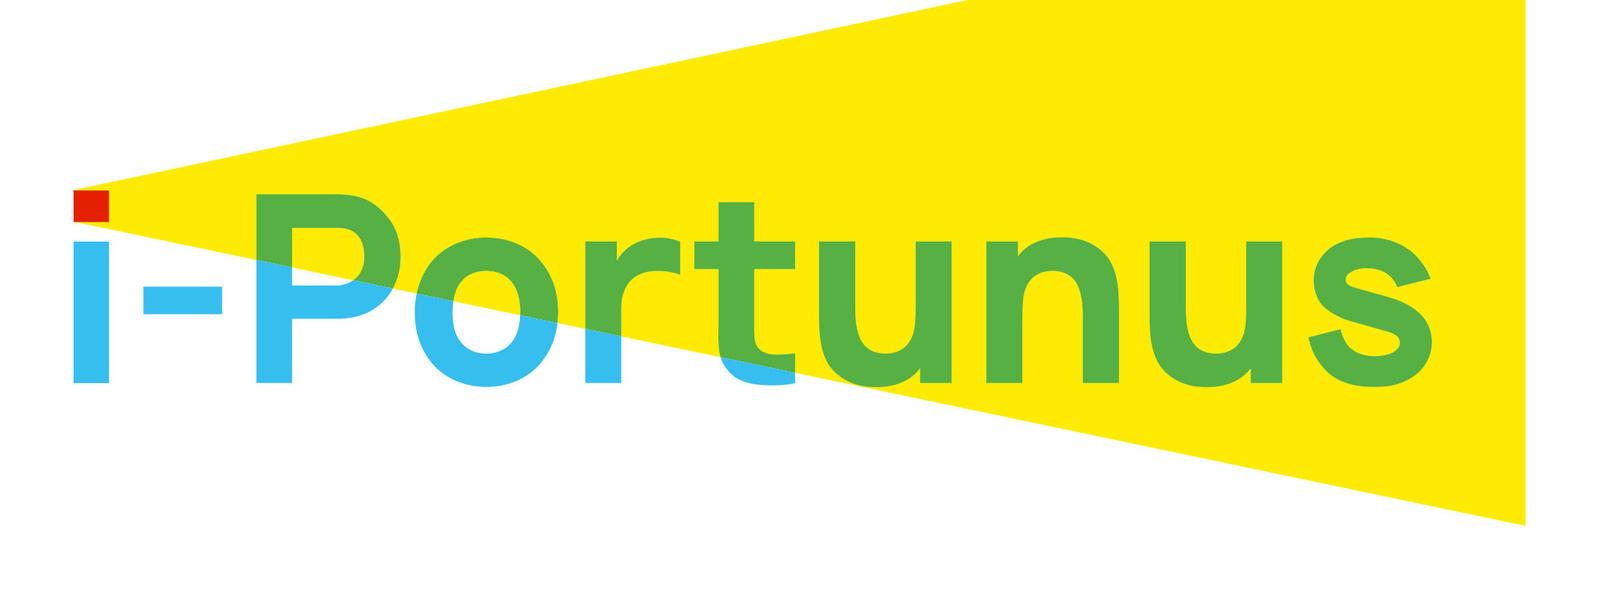 i-portunus-logo.jpg